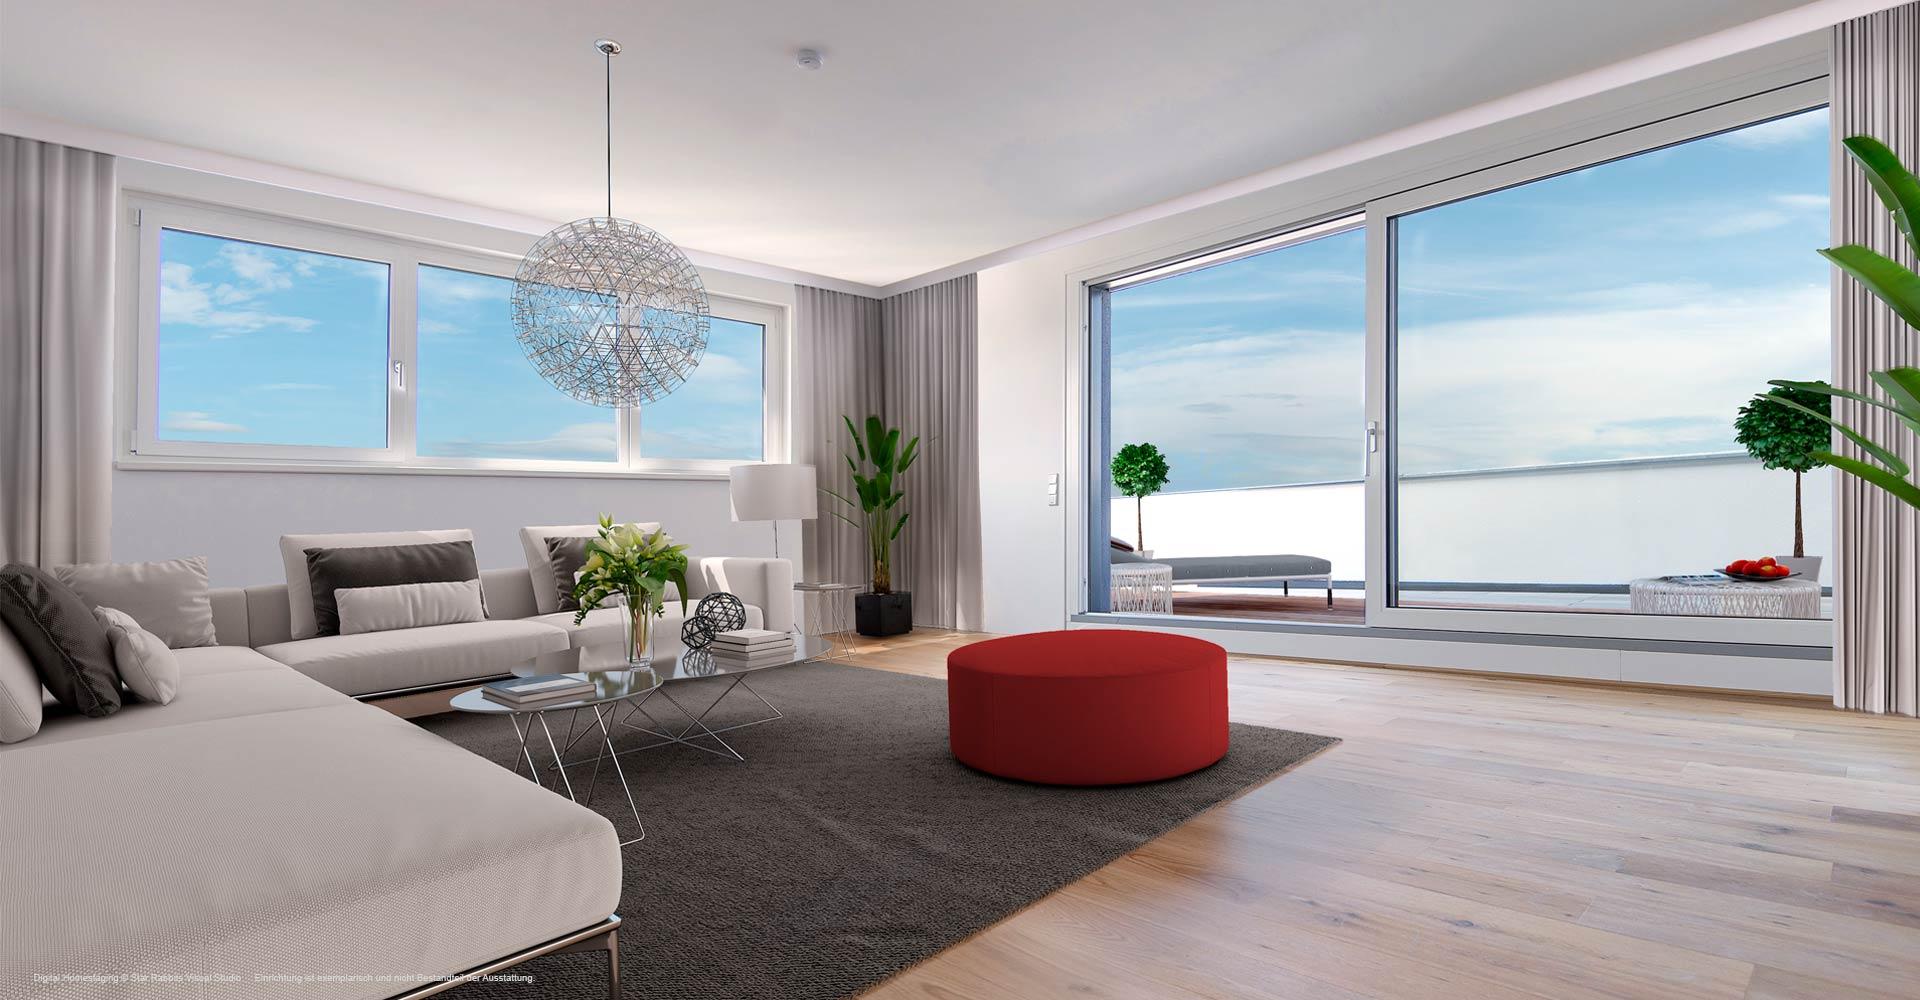 mietwohnungen 2320 schwechat villanova miete. Black Bedroom Furniture Sets. Home Design Ideas